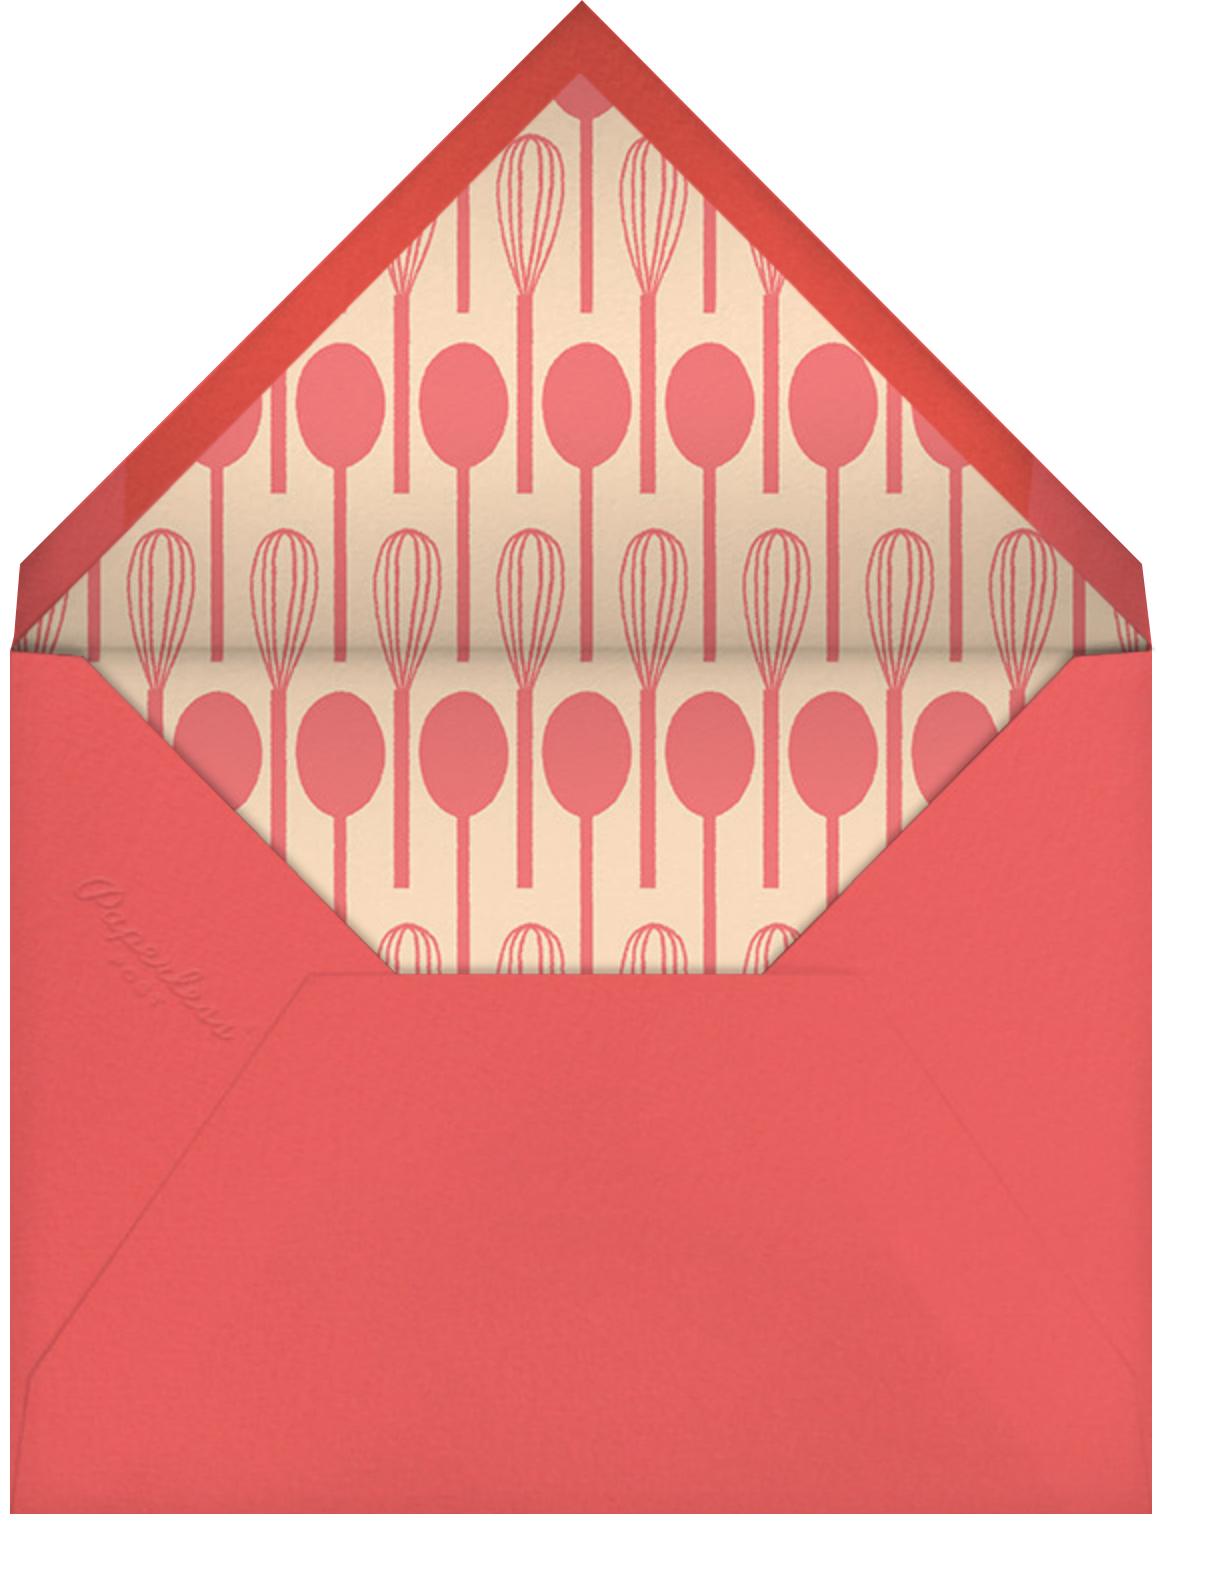 Apron Strings - Paperless Post - Envelope